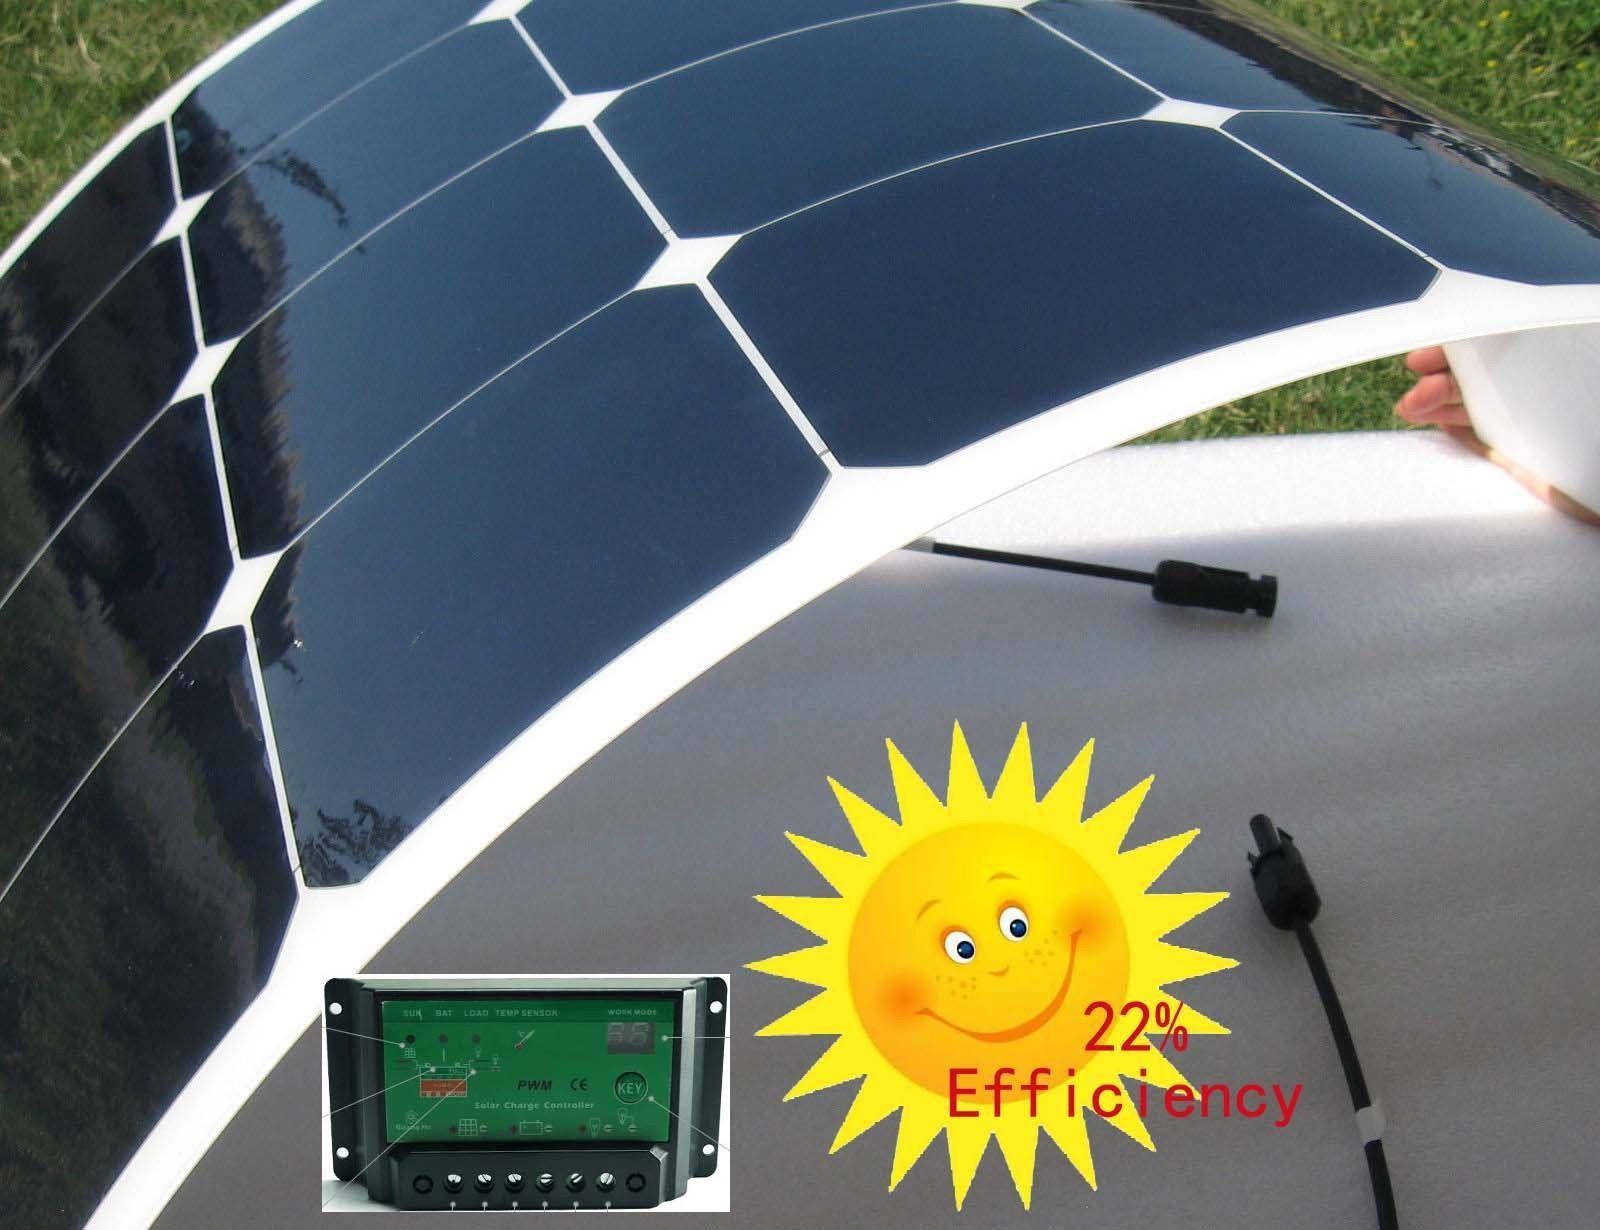 Sundely Solar Panels eBay Home, Furniture & DIY